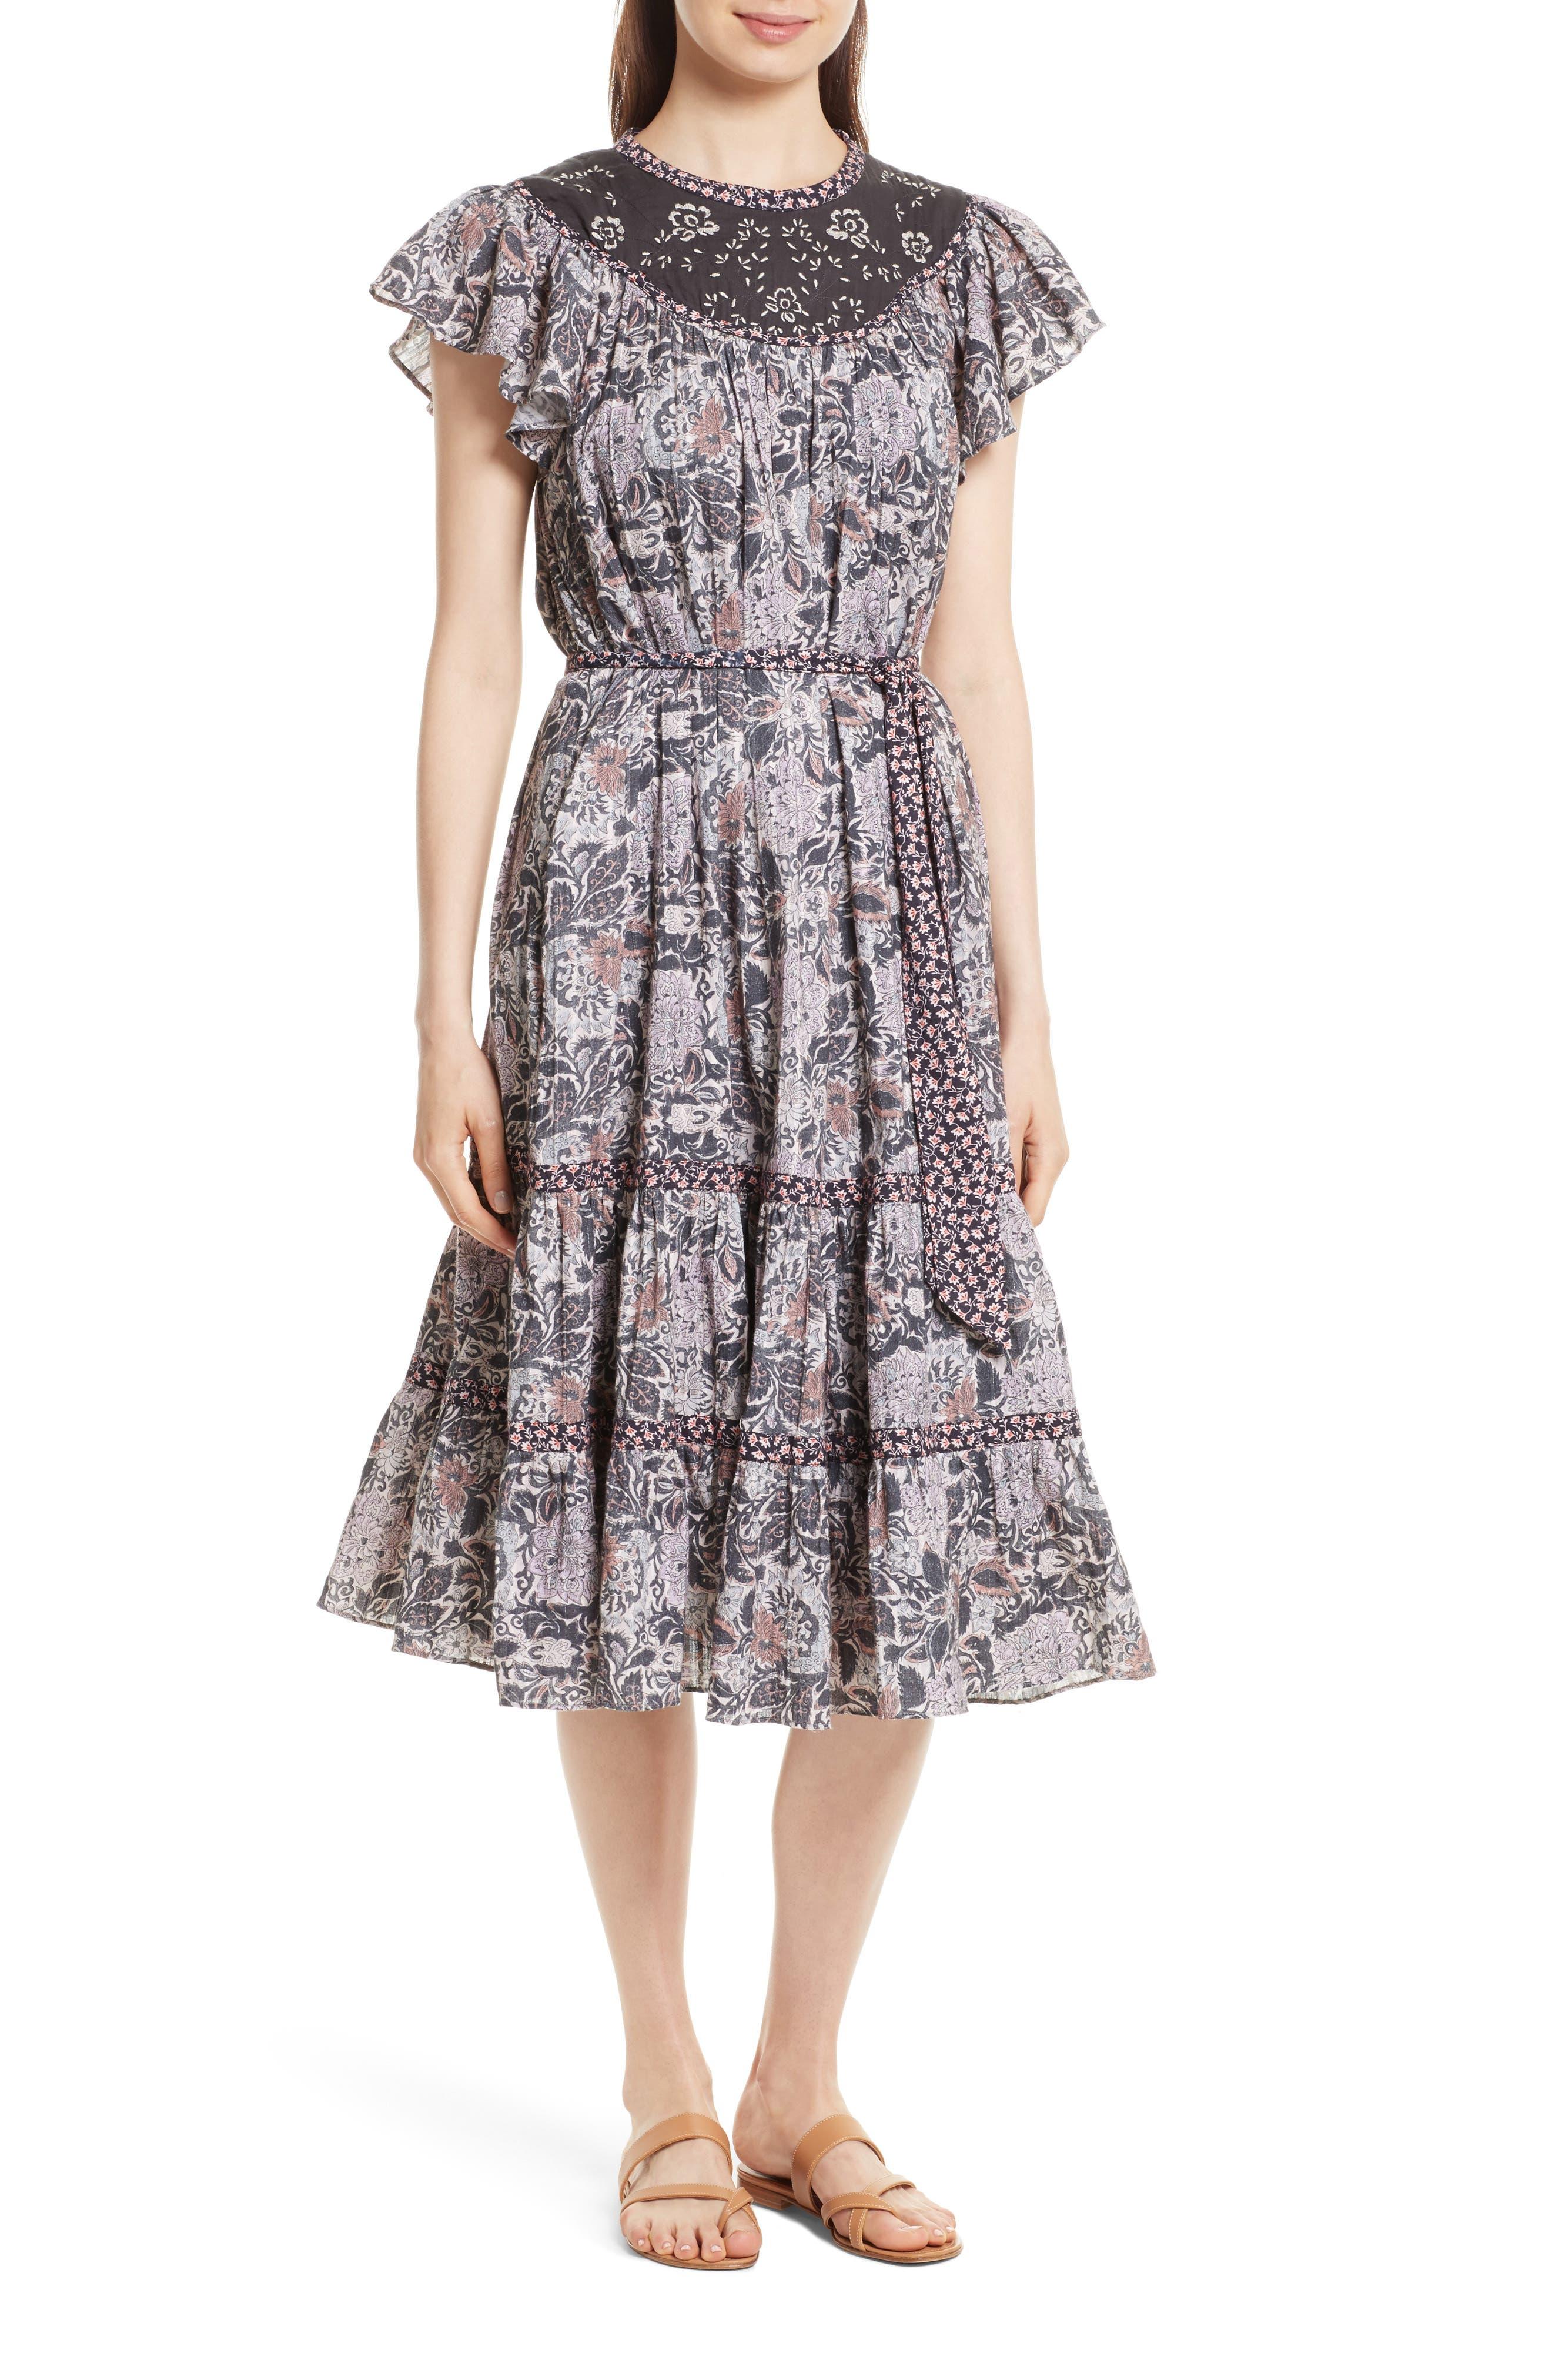 LA VIE REBECCA TAYLOR Indochine Embroidered Floral Dress